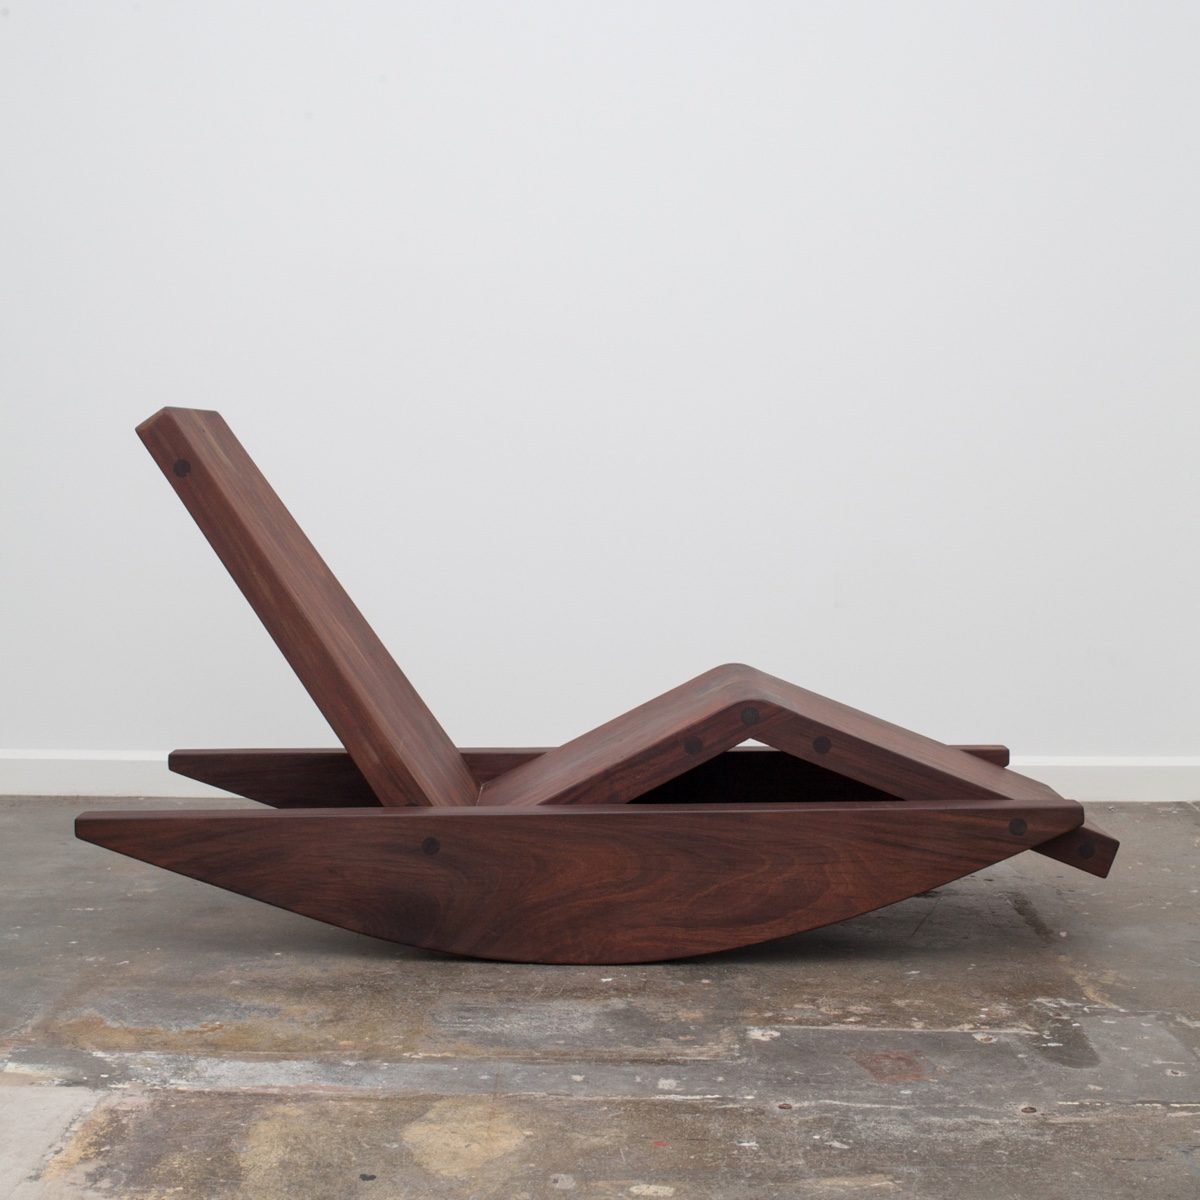 BalançobyZanini de Zanine is an ergonomic and sculptural chaise longue made usingreclaimed Ipê wood.